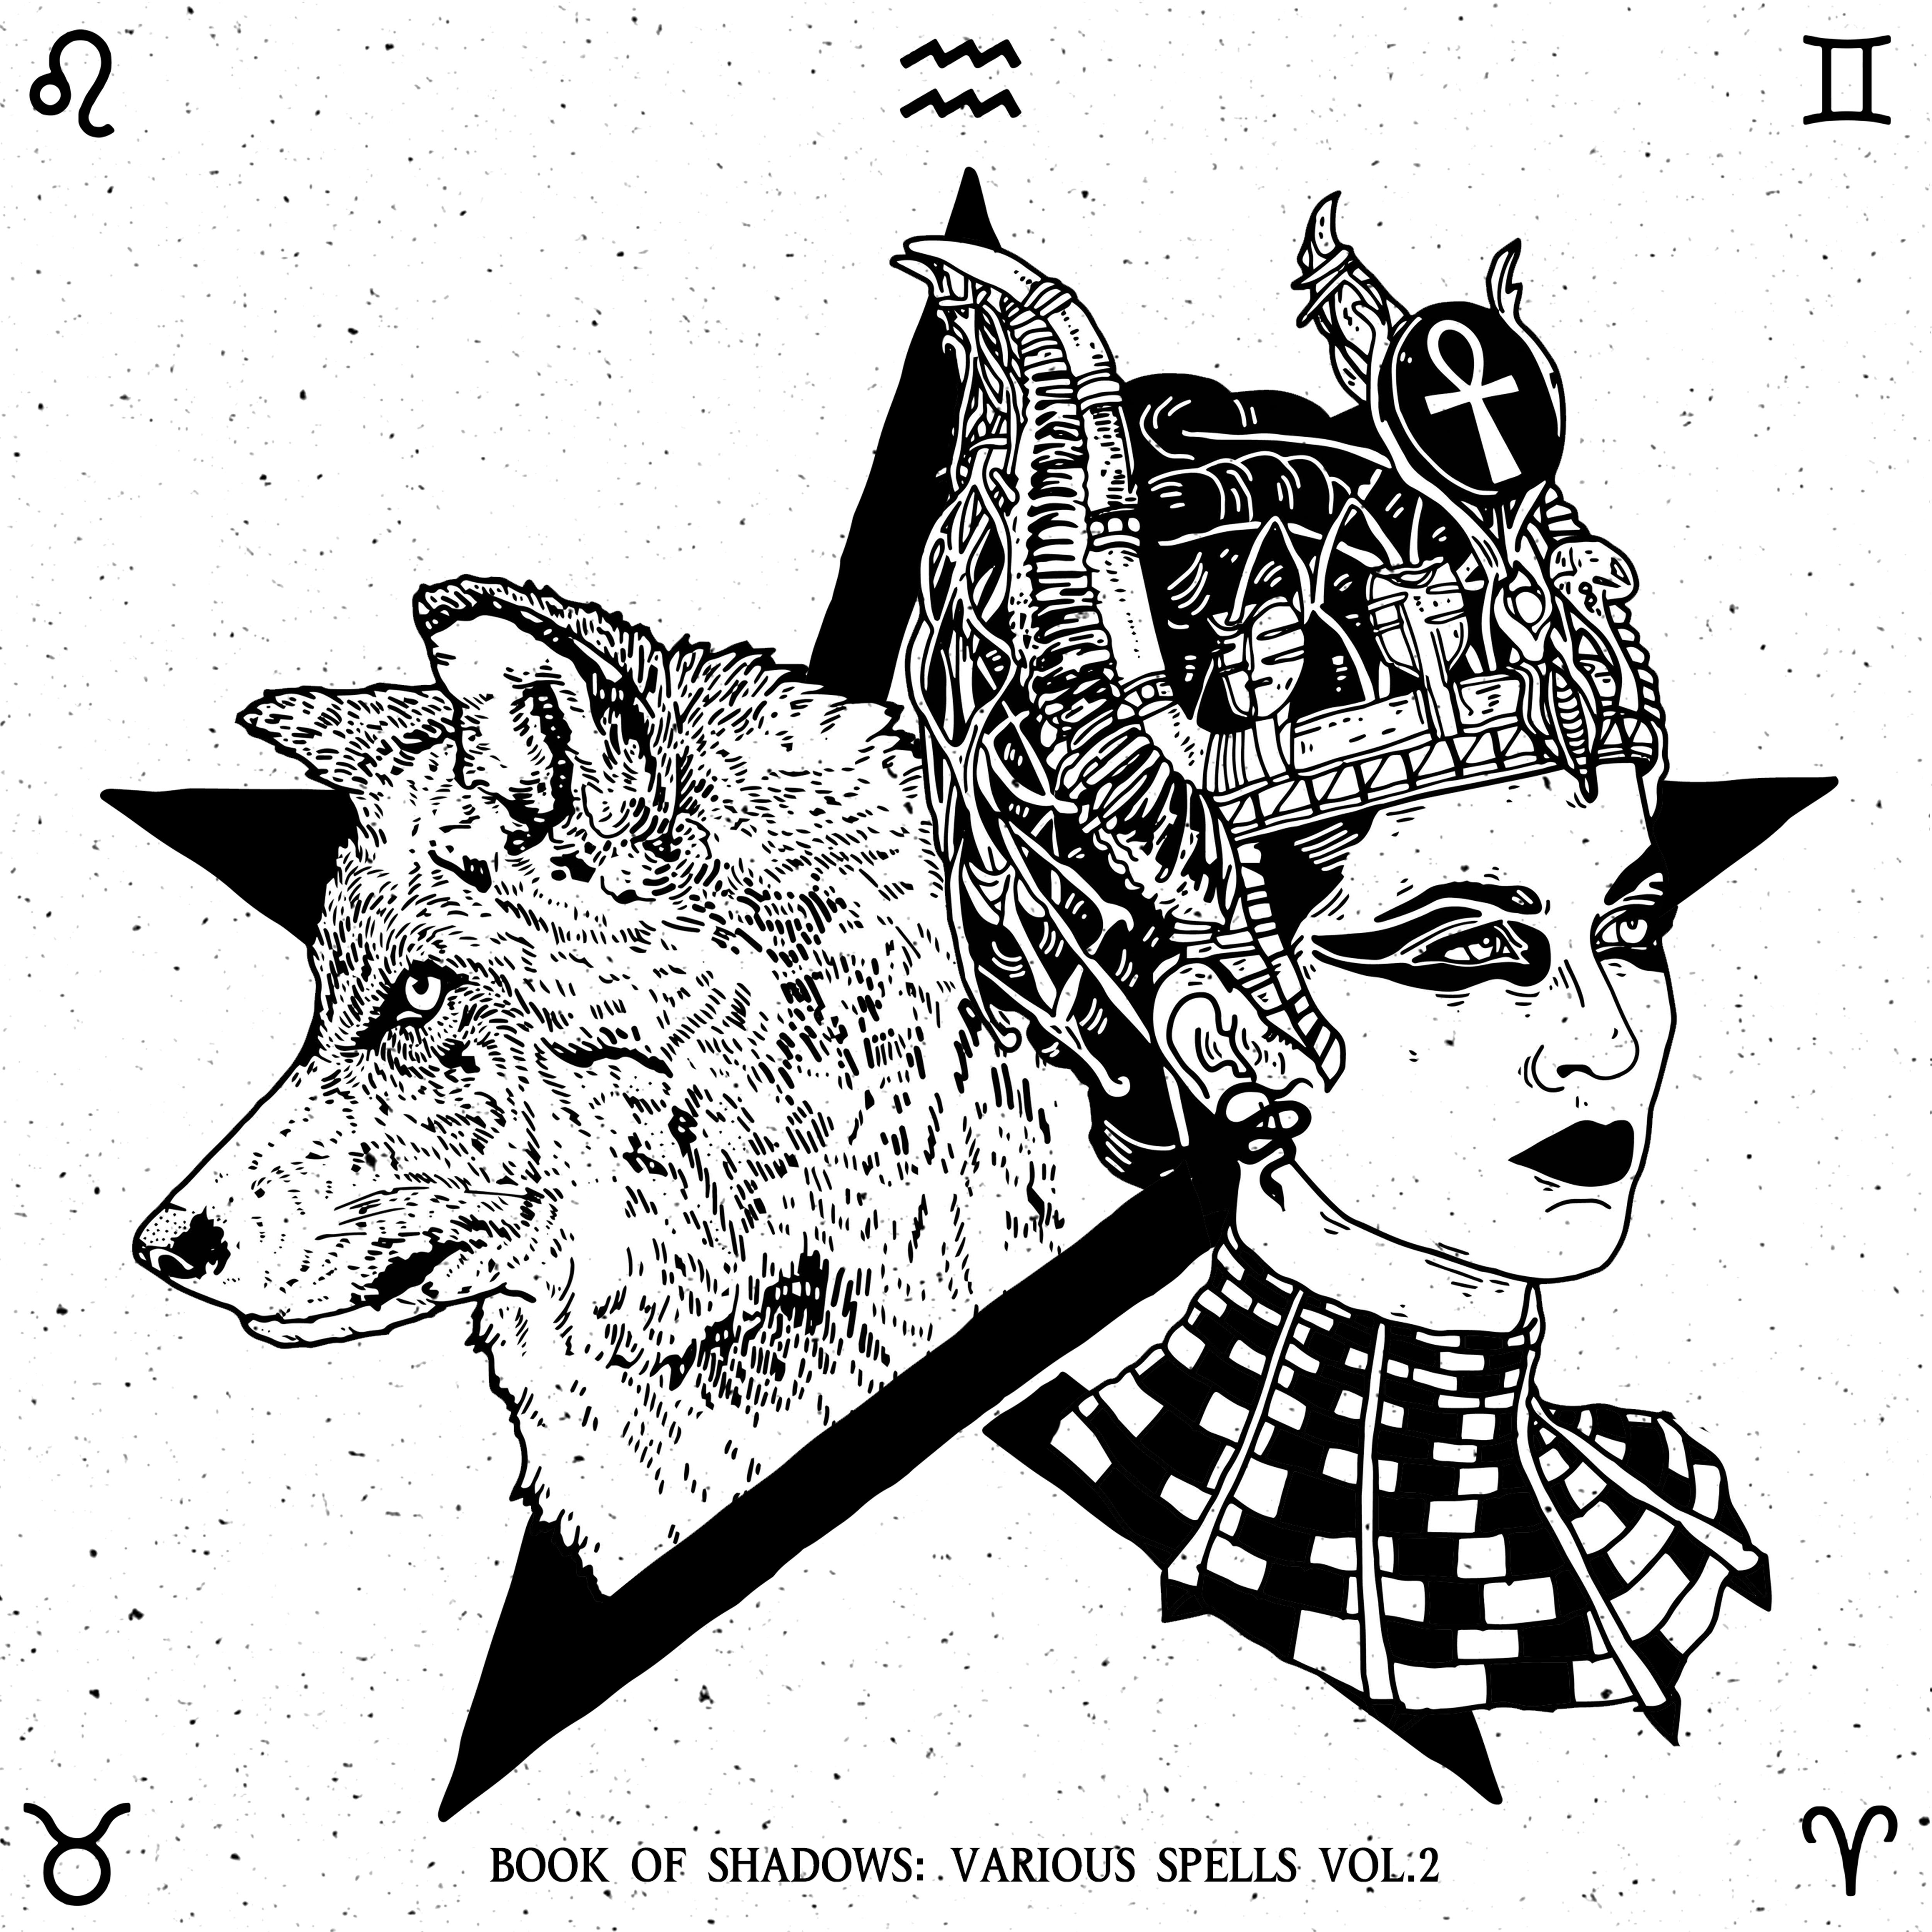 PREMIERE – Lucia Luna – Origami (Occultists)